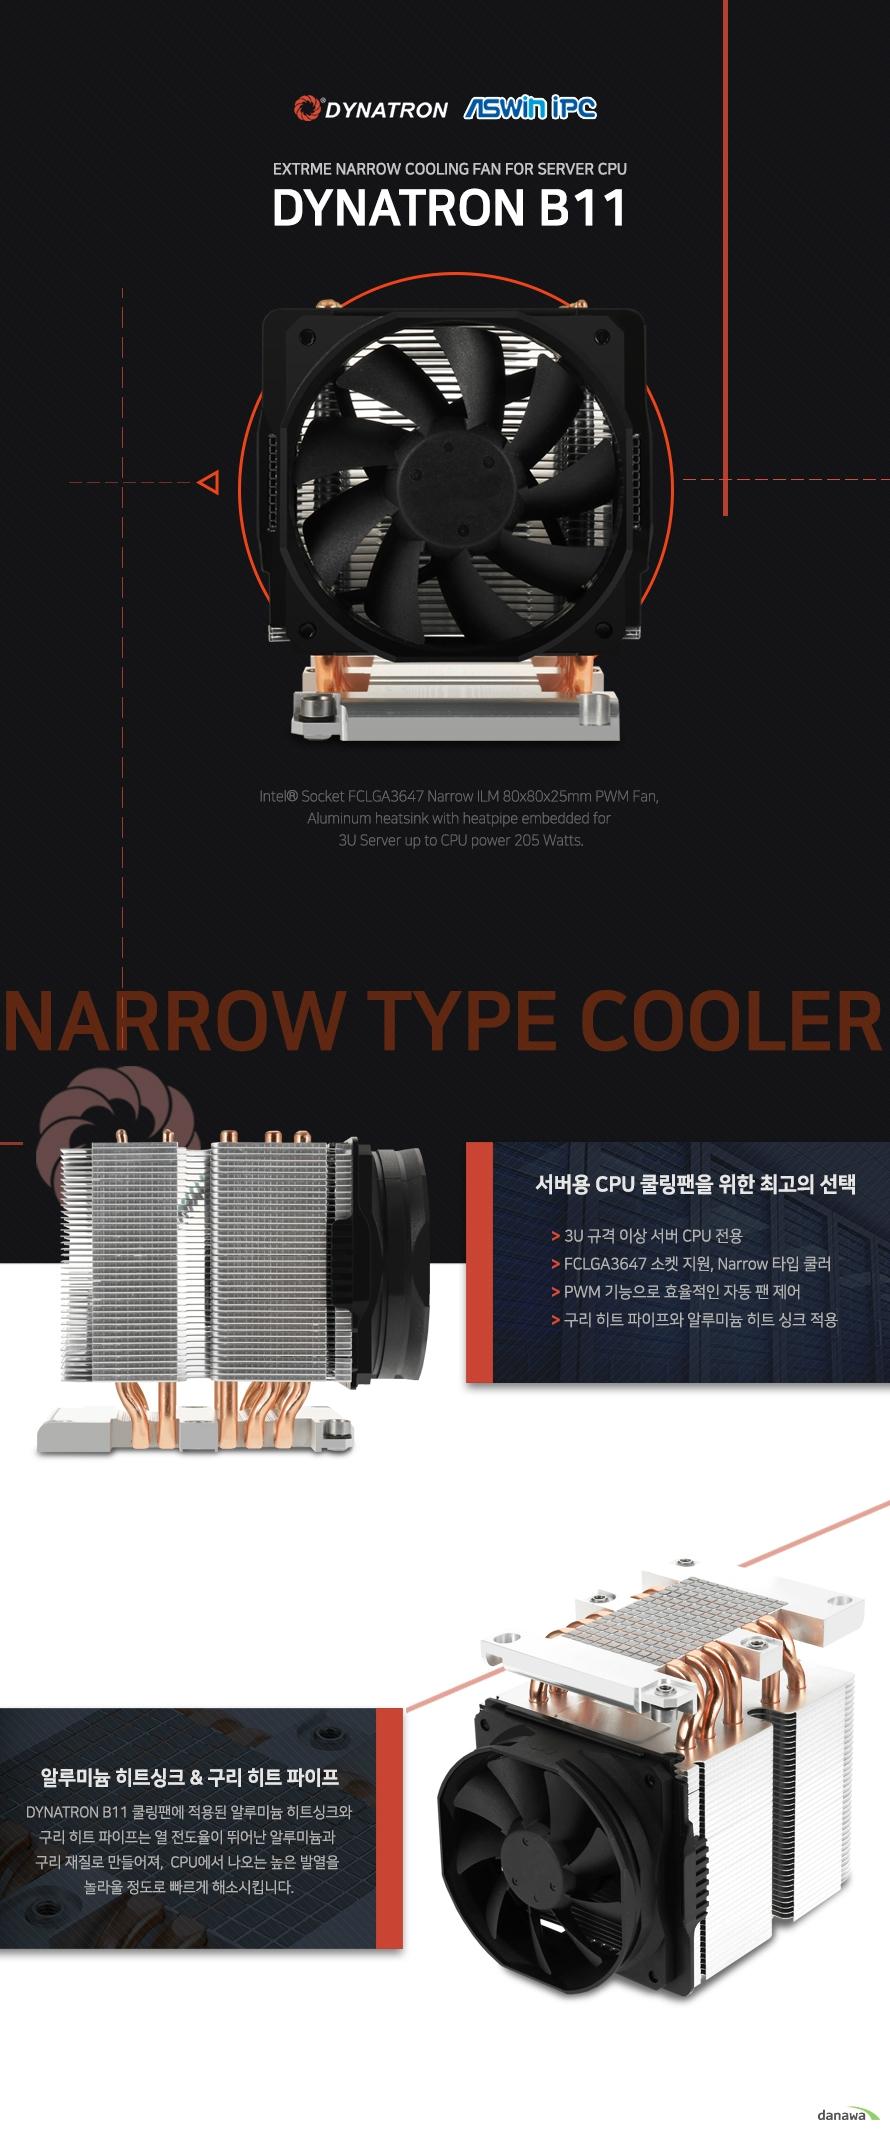 THE BEST COOLER OF THE WORLD        세계 최고의 쿨러를 제조한다는 굳은 신념으로 DYNATRON은 최상급 성능의 쿨러만을 고집합니다.        괴물같은 성능의 80MM AXIAL 쿨링팬    DYNATRON B11 쿨러의 80MM AXIAL 쿨링팬은 최대 4000RPM 이라는 괴물같은 성능으로    24시간 끊임없이 구동하는 서버용 CPU를 항상 최적의 온도로 유지시켜줍니다.        오랜 사용에도 변함없는 쿨링팬 내구성        쉴틈없이 구동해야 하는 서버용 CPU쿨러에 오랜 사용에도 변함없는 안정적인 쿨링팬은 필수입니다.    DYNATRON B11은 쿨링팬에 2 BALL BEARING을 적용하여 뛰어난 내구성으로 오랜 사용에도 변함없는    성능을 제공합니다.